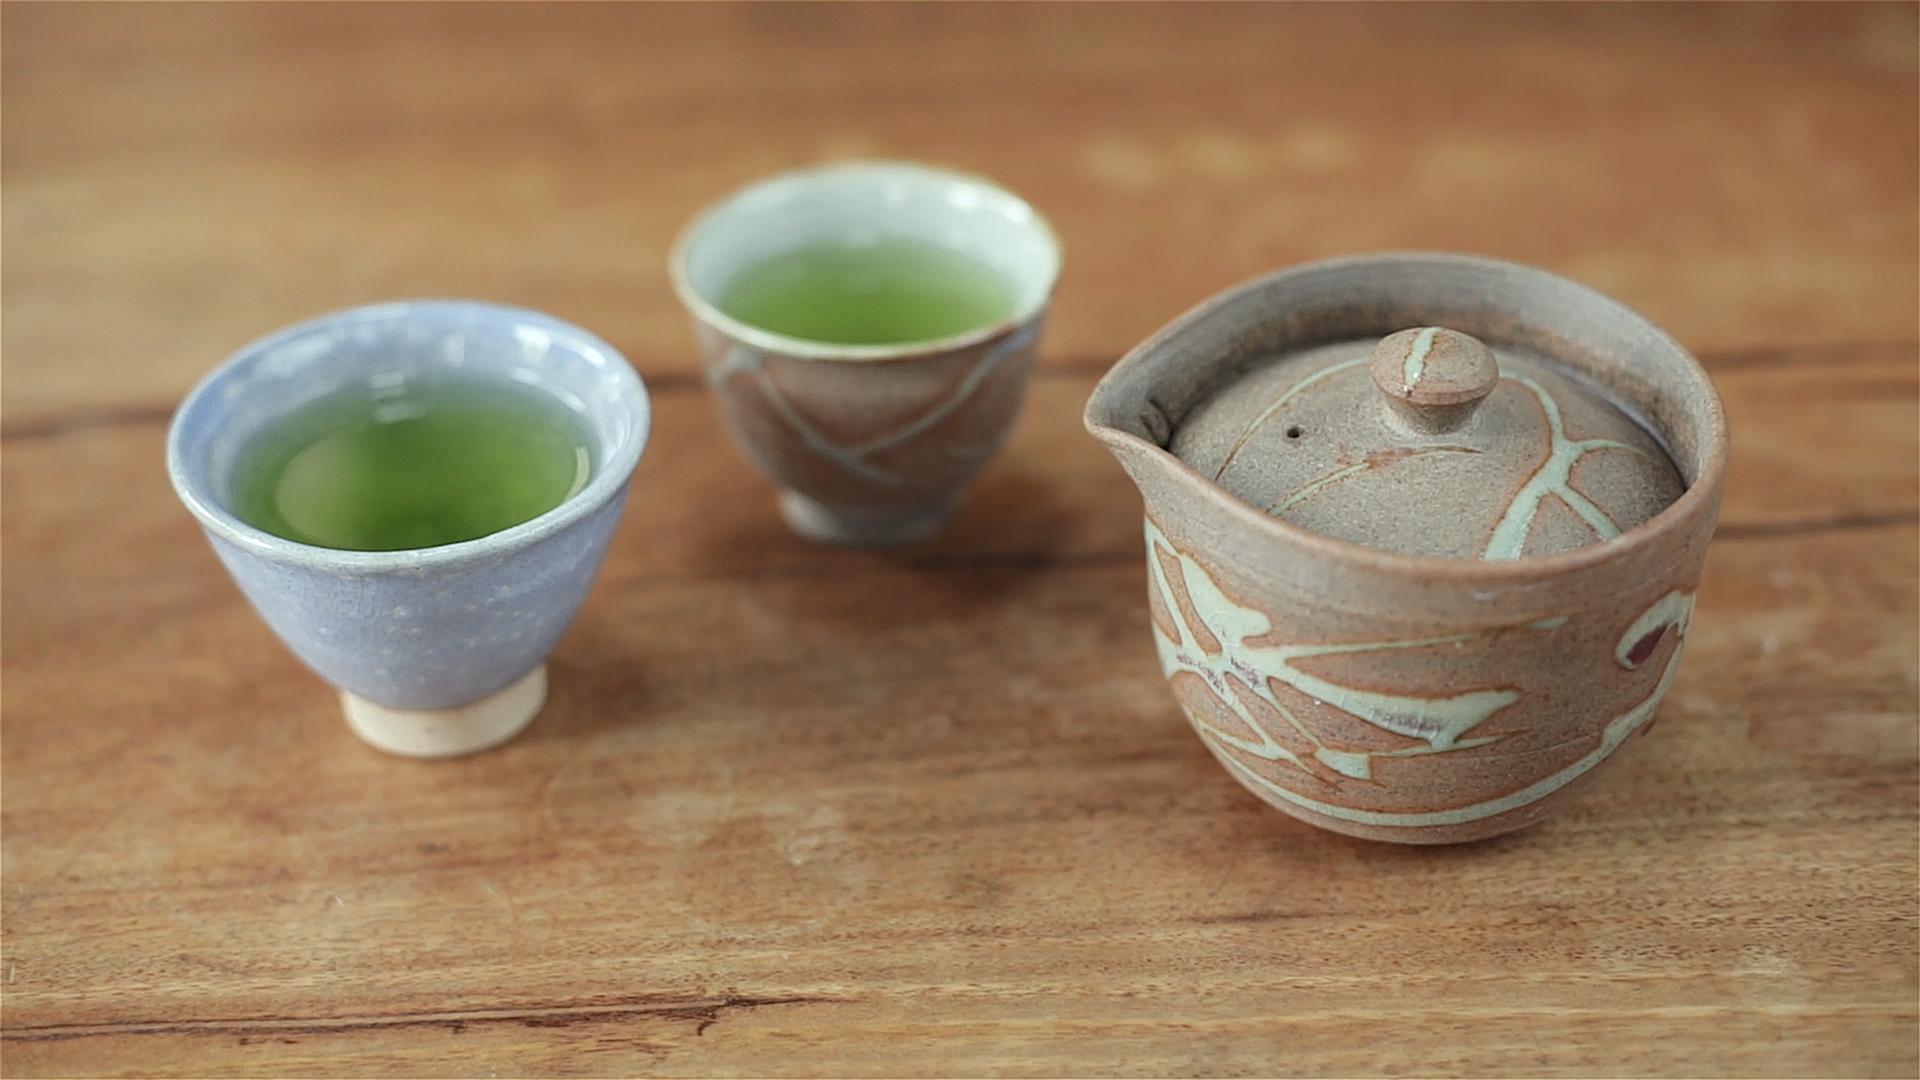 KIRISHIMA ARACHA SHINCHA - Kabuse Asatsuyu cultivar, infusion intensive dans un kyusu de Narieda Shinichiro pour profiter pleinement du thé (Photo : Arun Herzog)